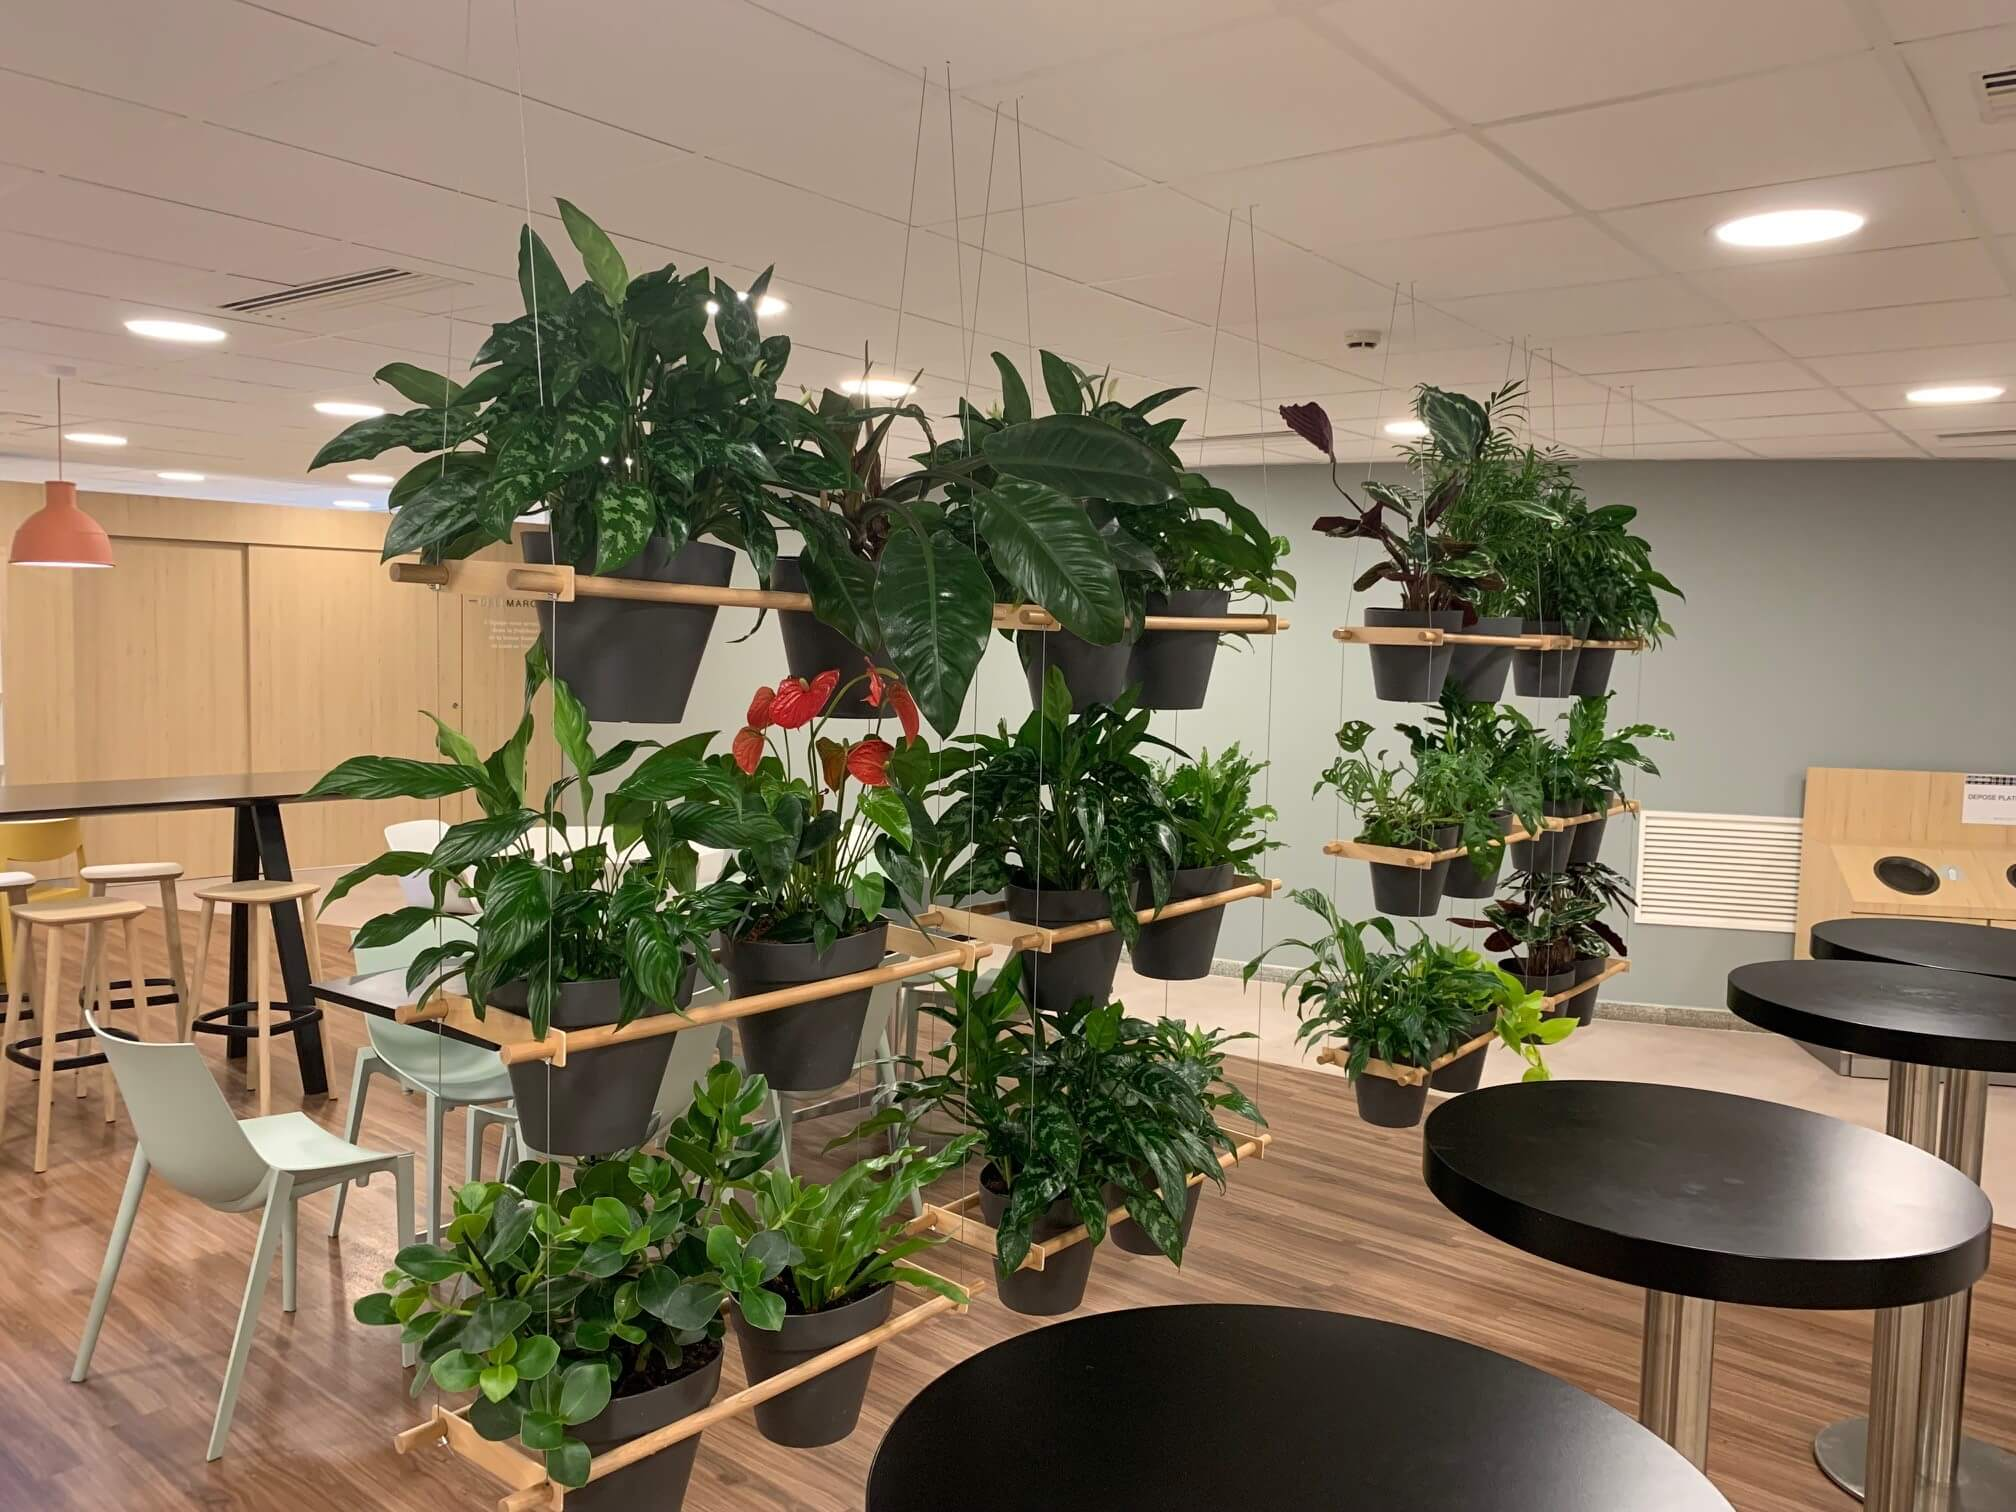 plantes-vertes-naturelles-20